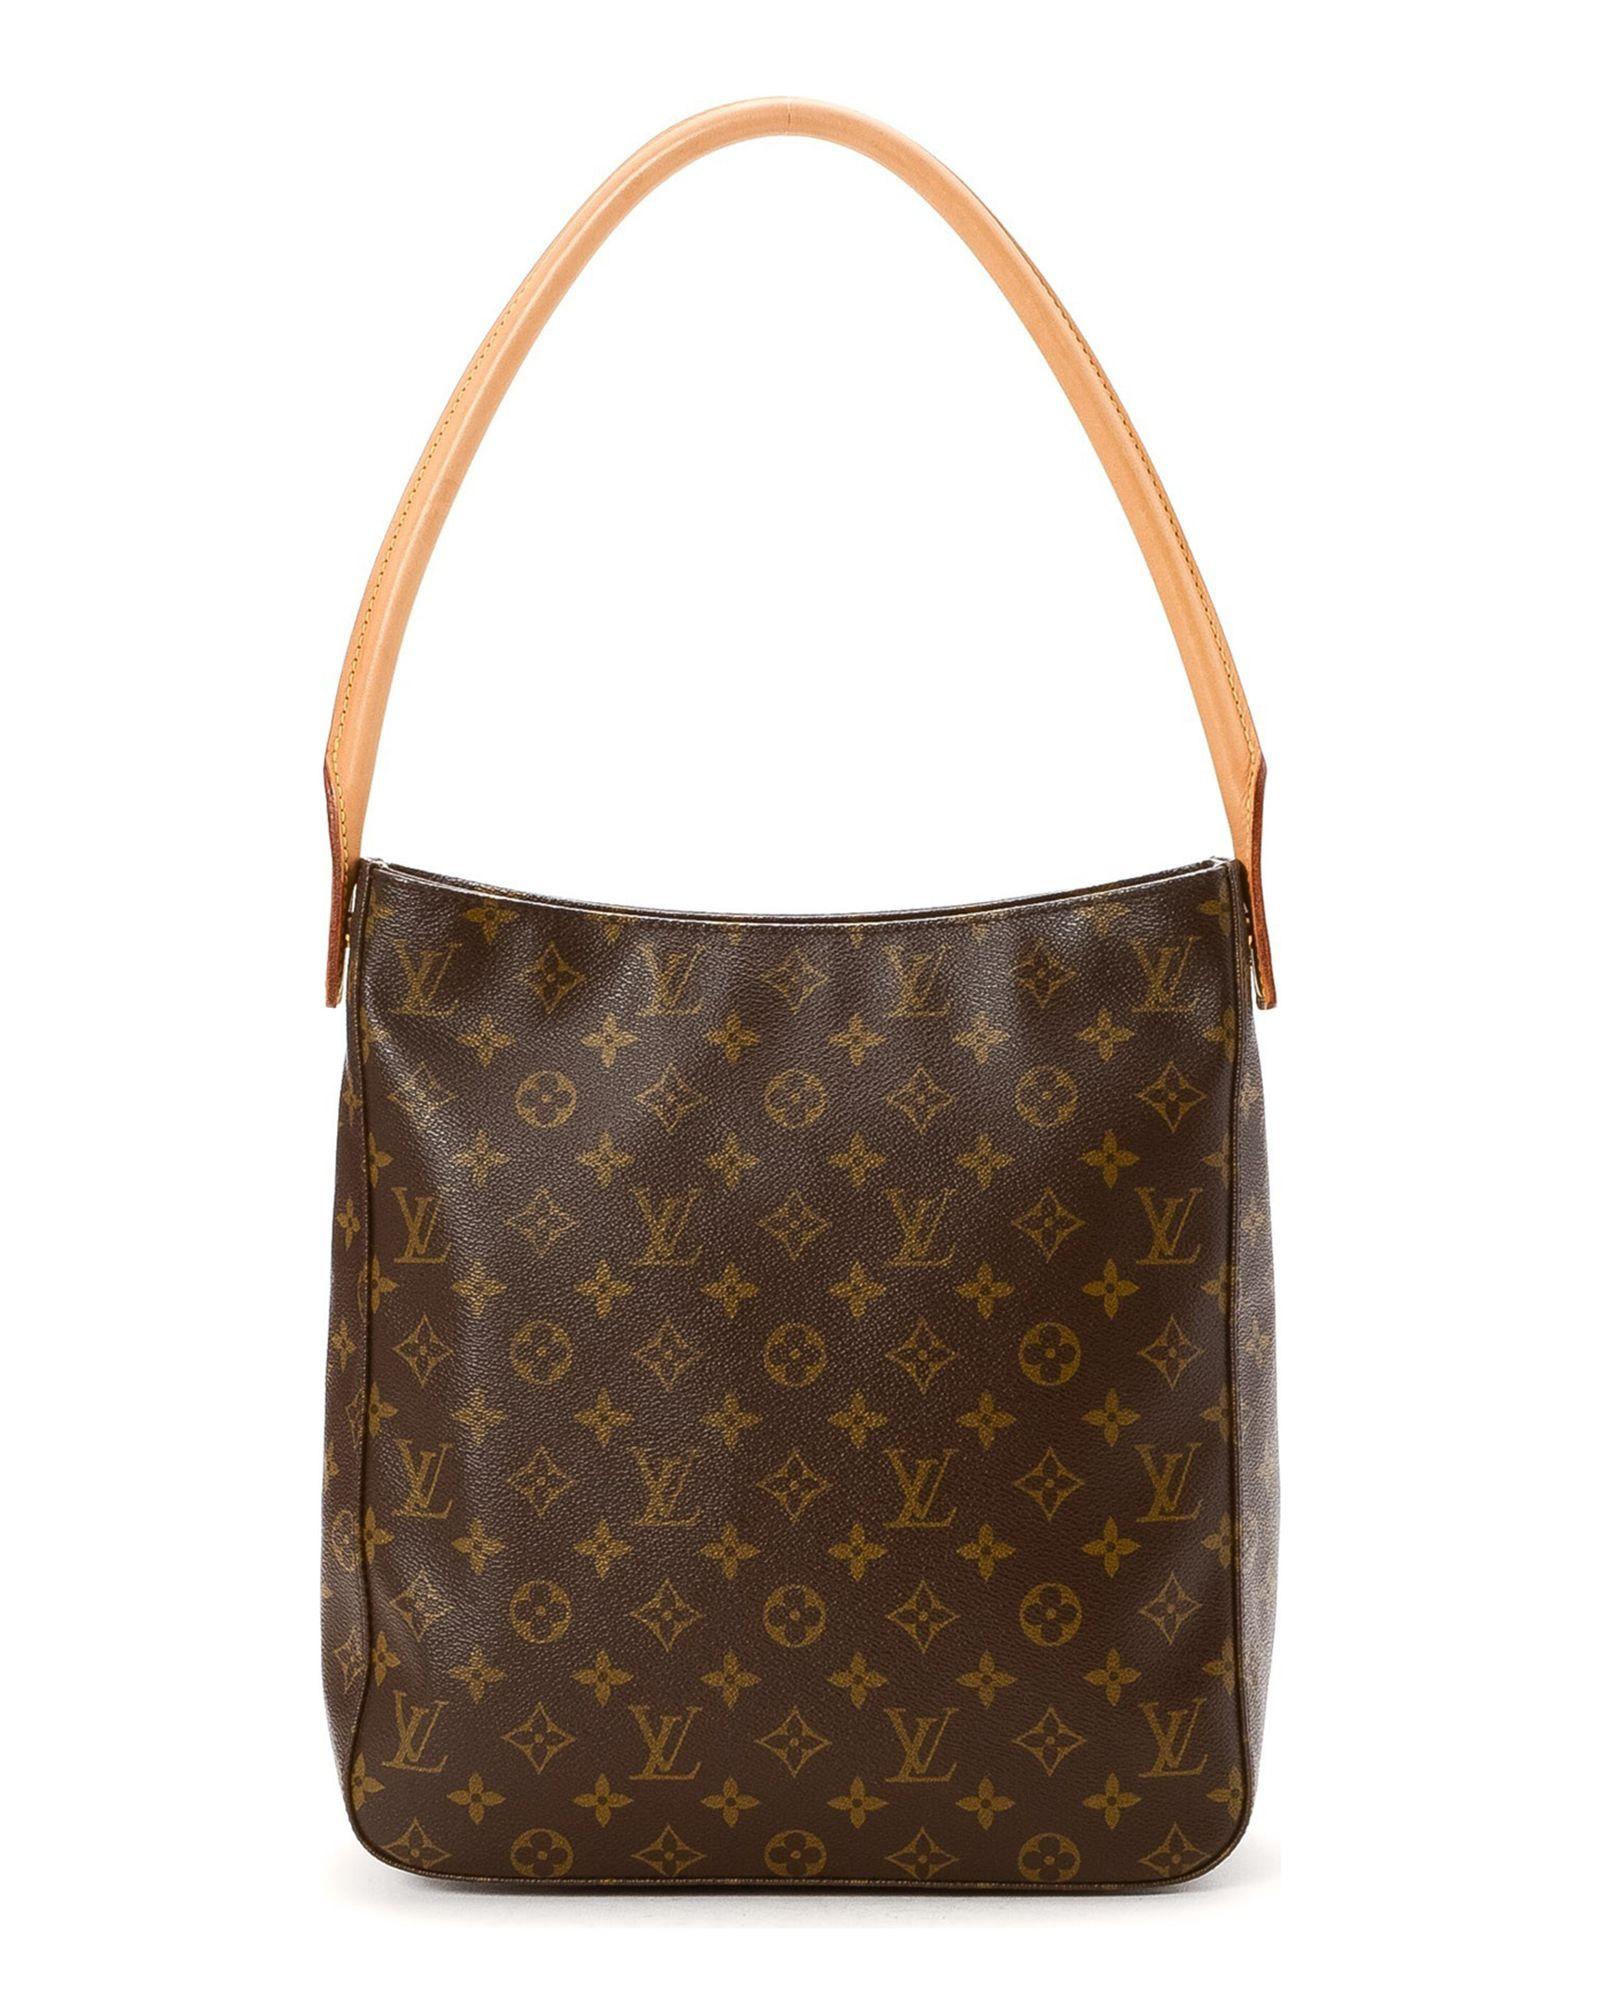 Louis Vuitton Looping GM Shoulder Bag - Vintage